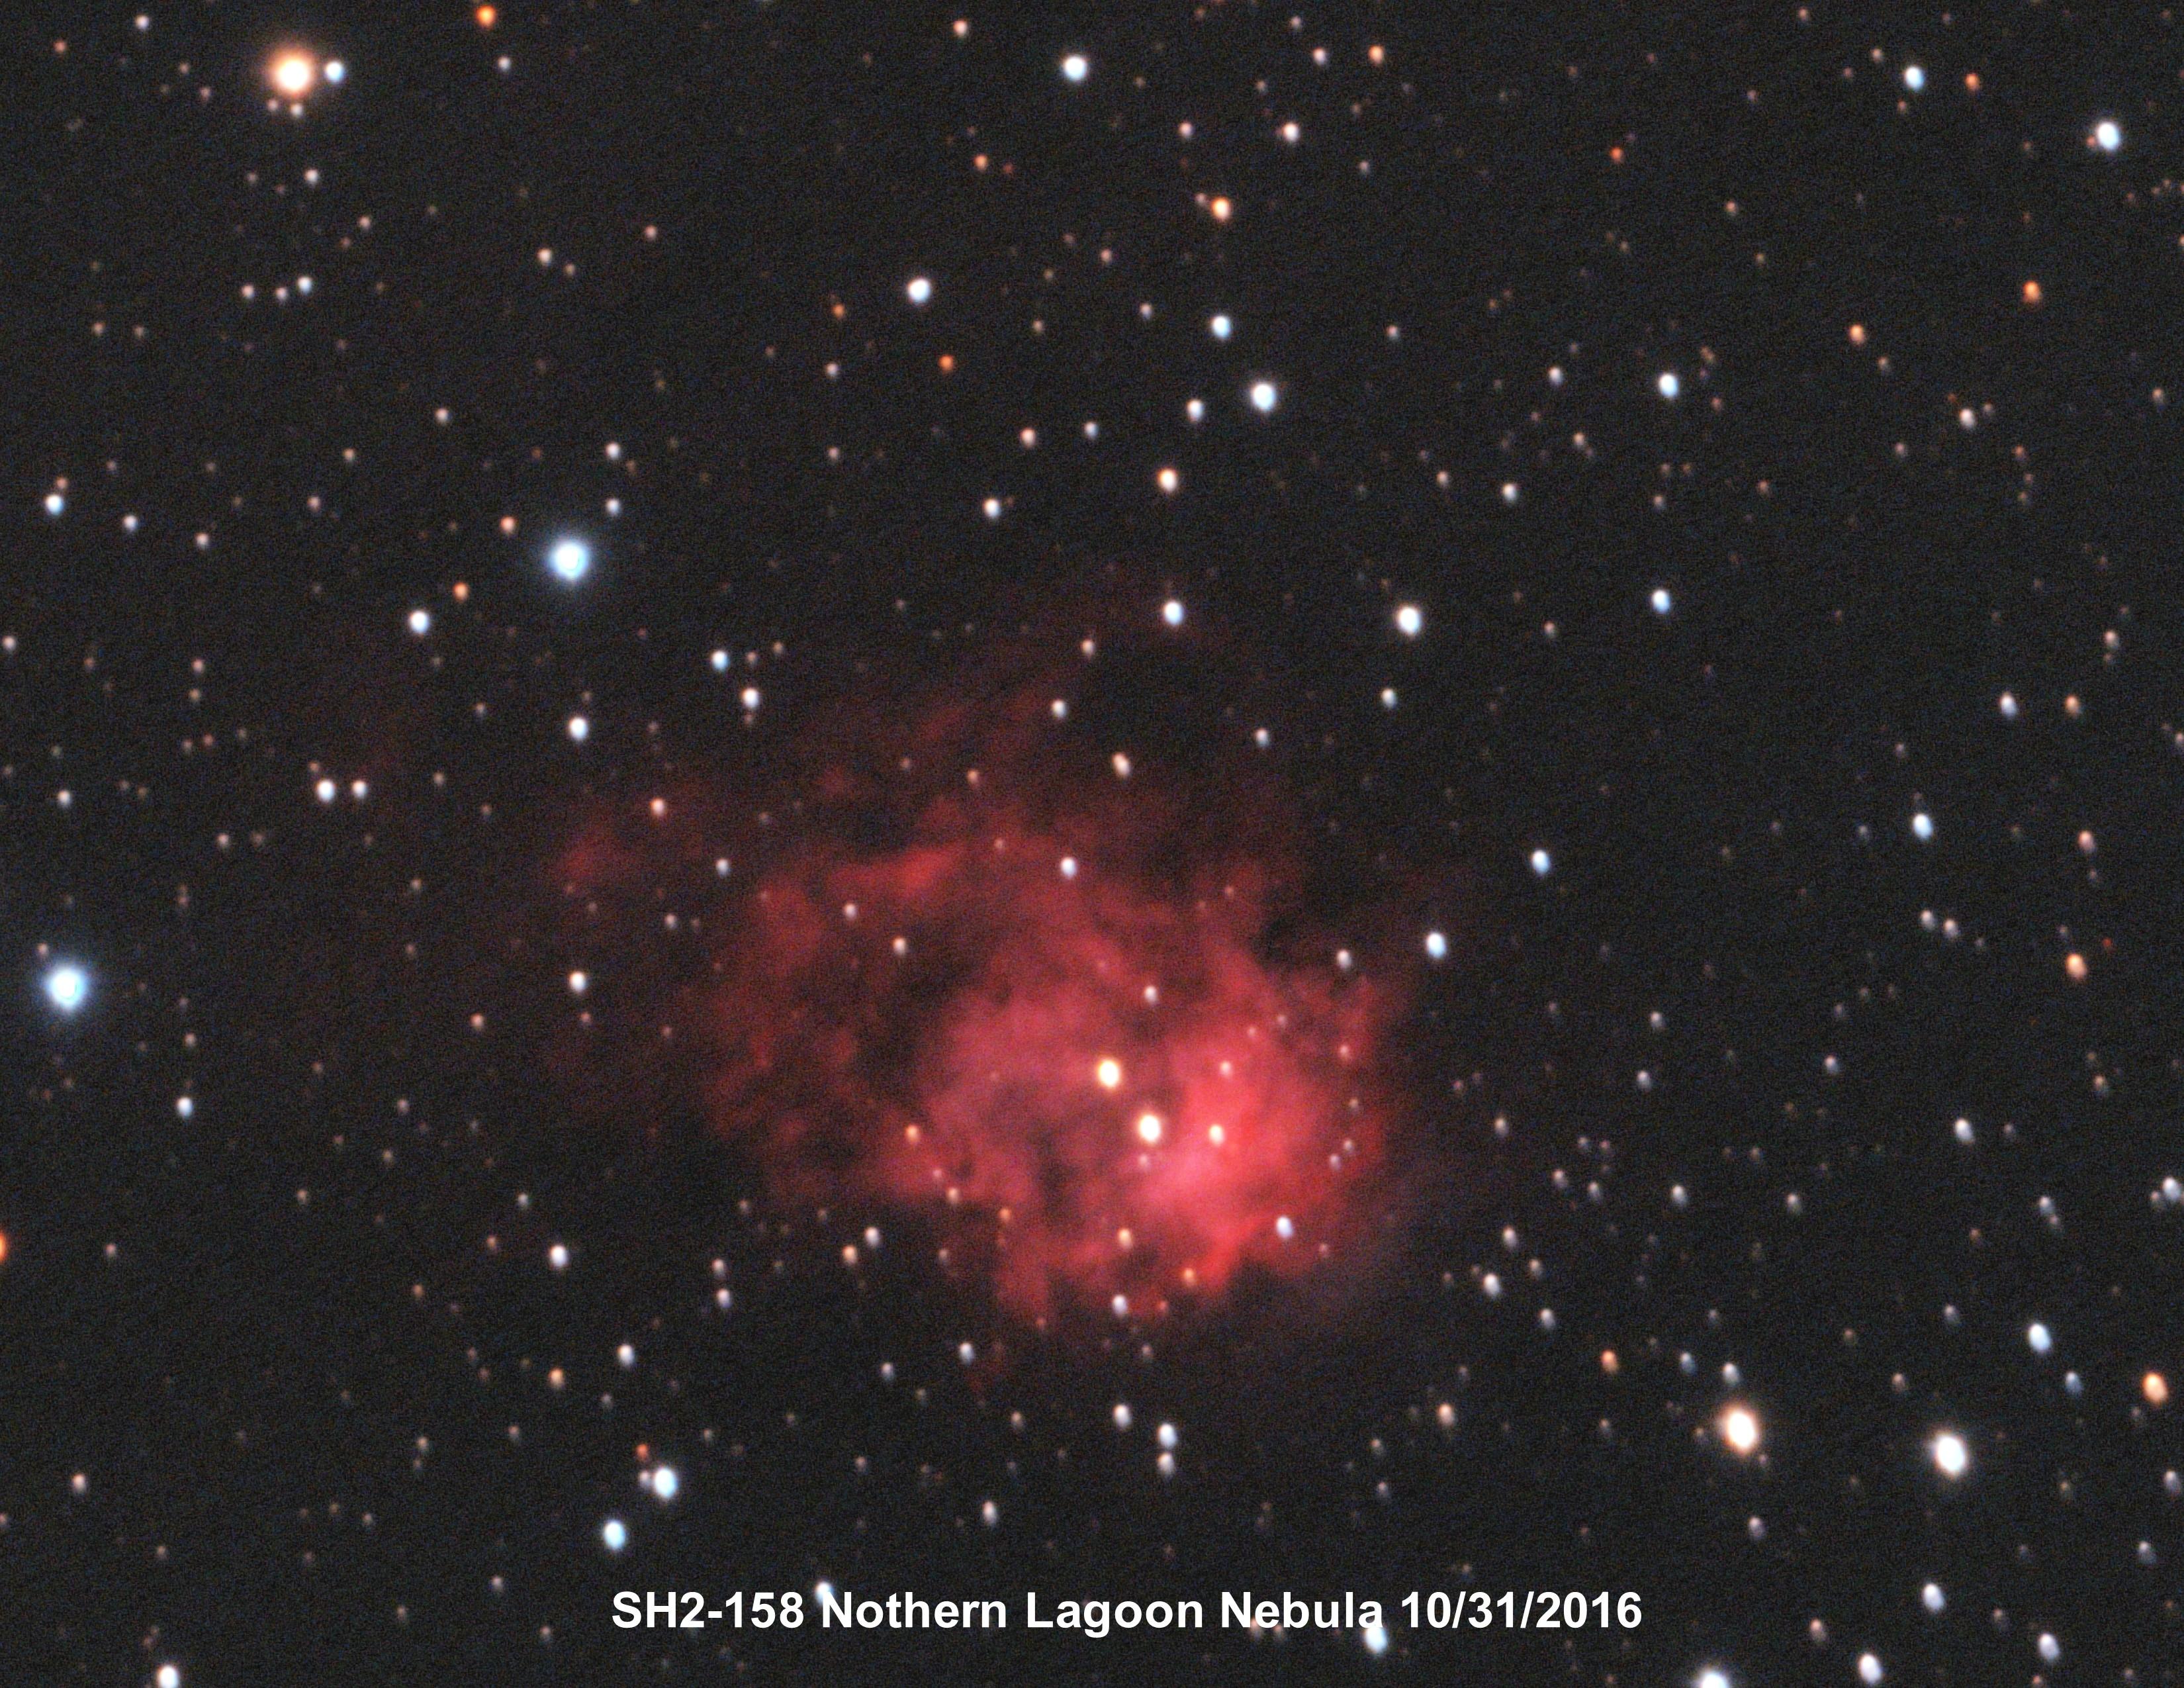 Sh2-158 Northern Lagoon